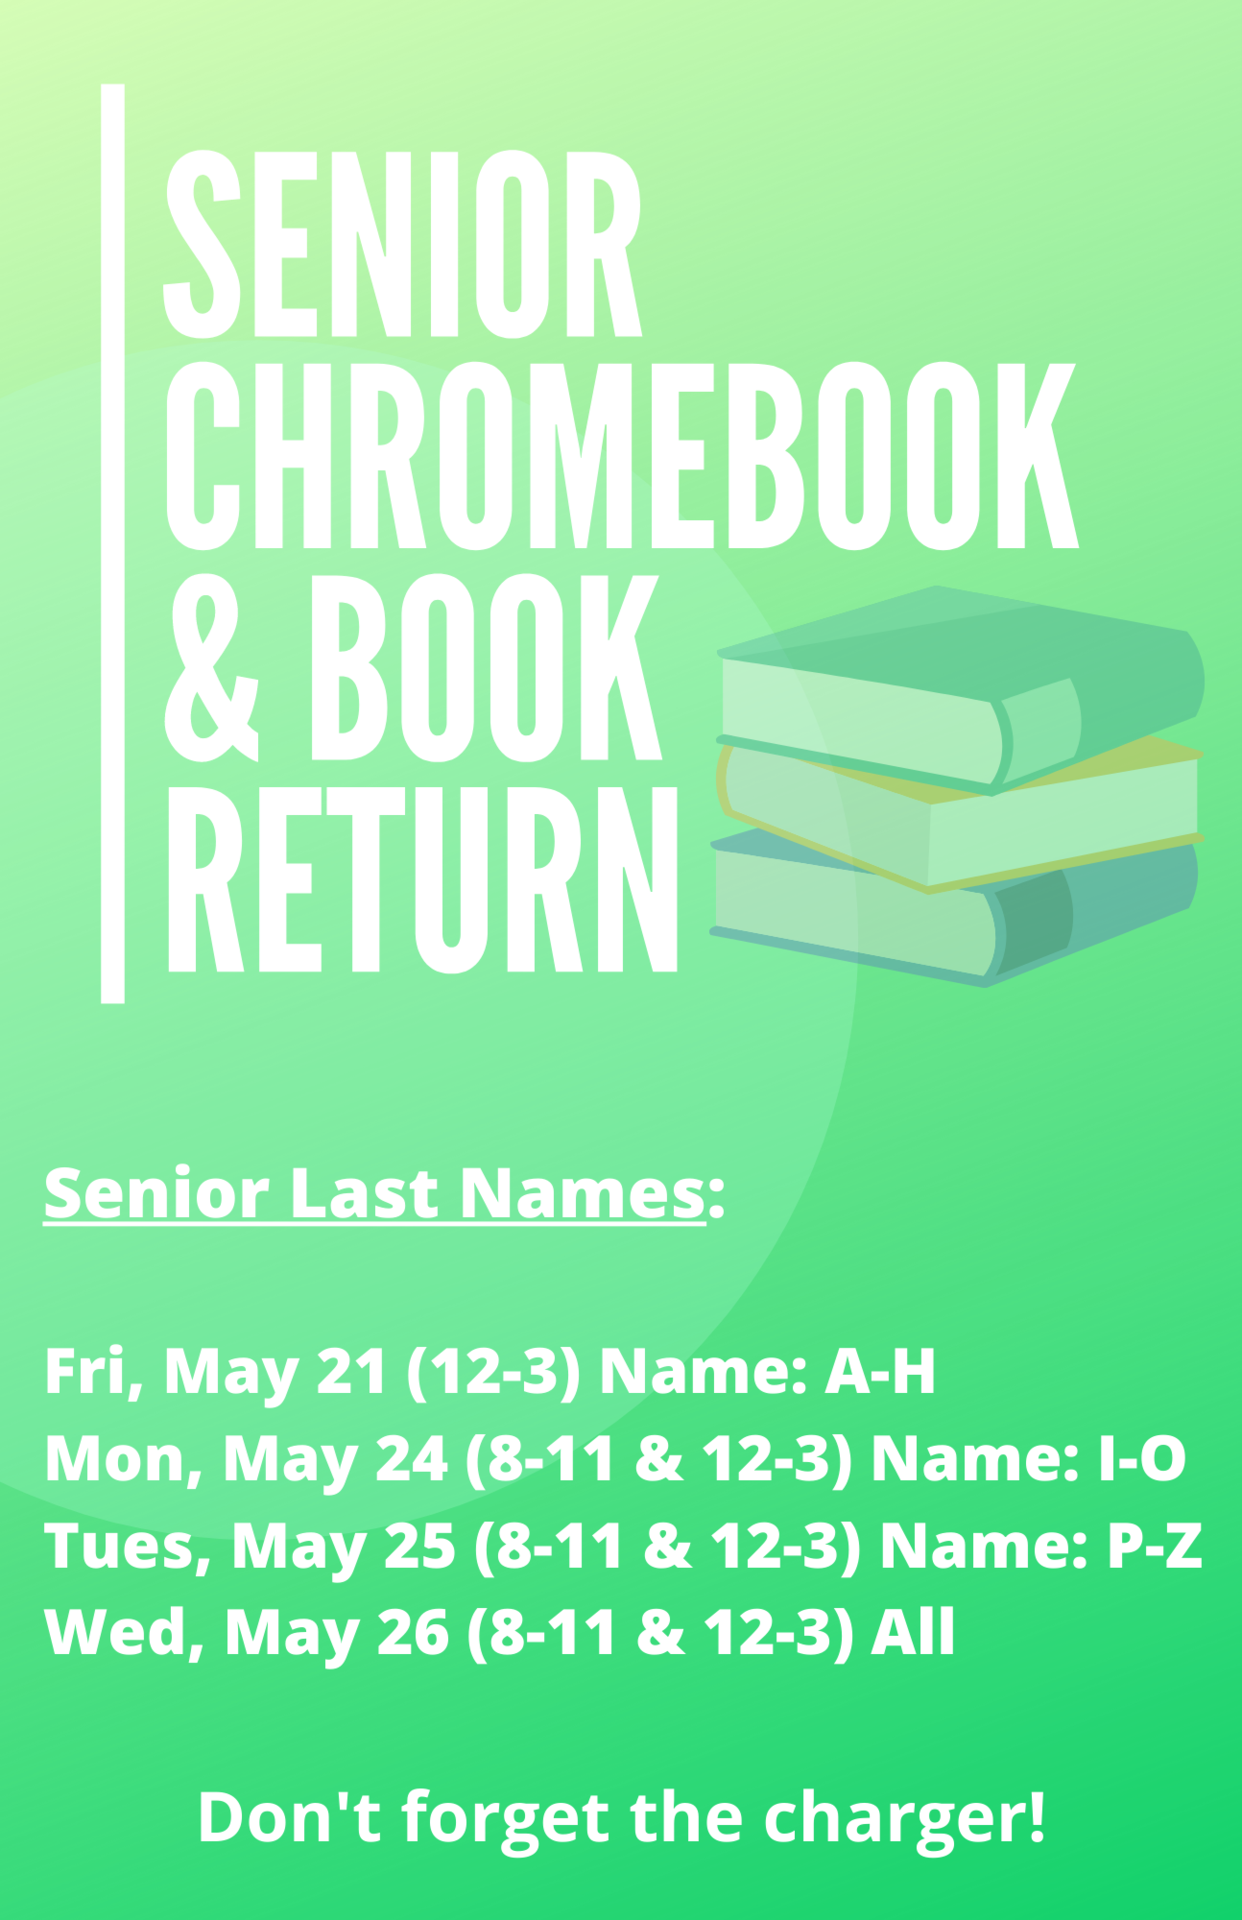 Senior Book Returns